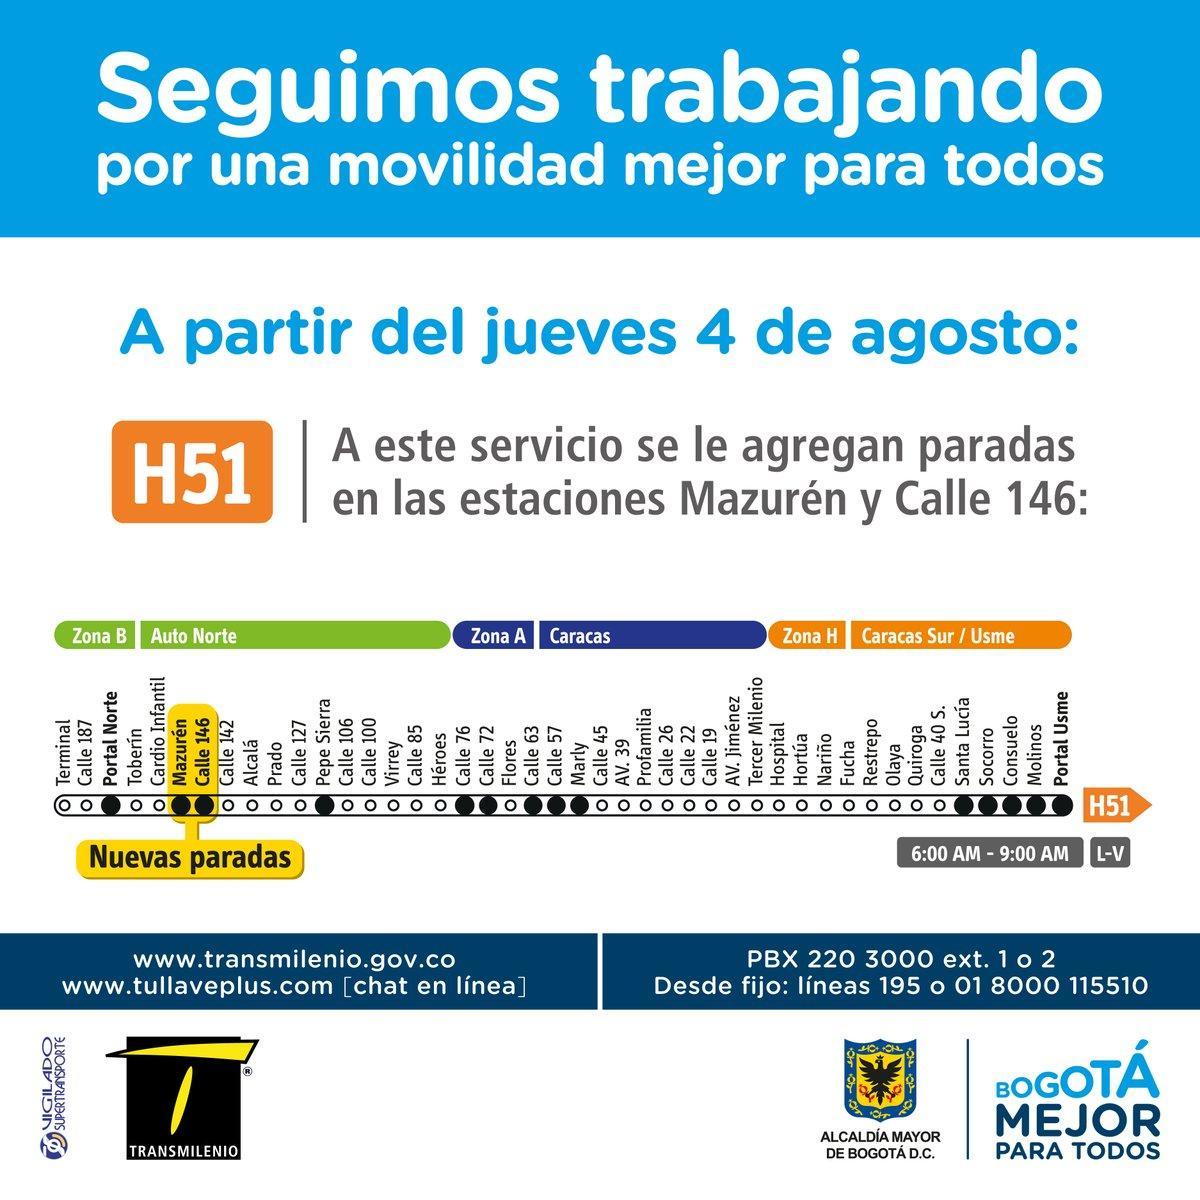 h51_mapa_informativo_transmilenio_cambios4agosto2016_opt